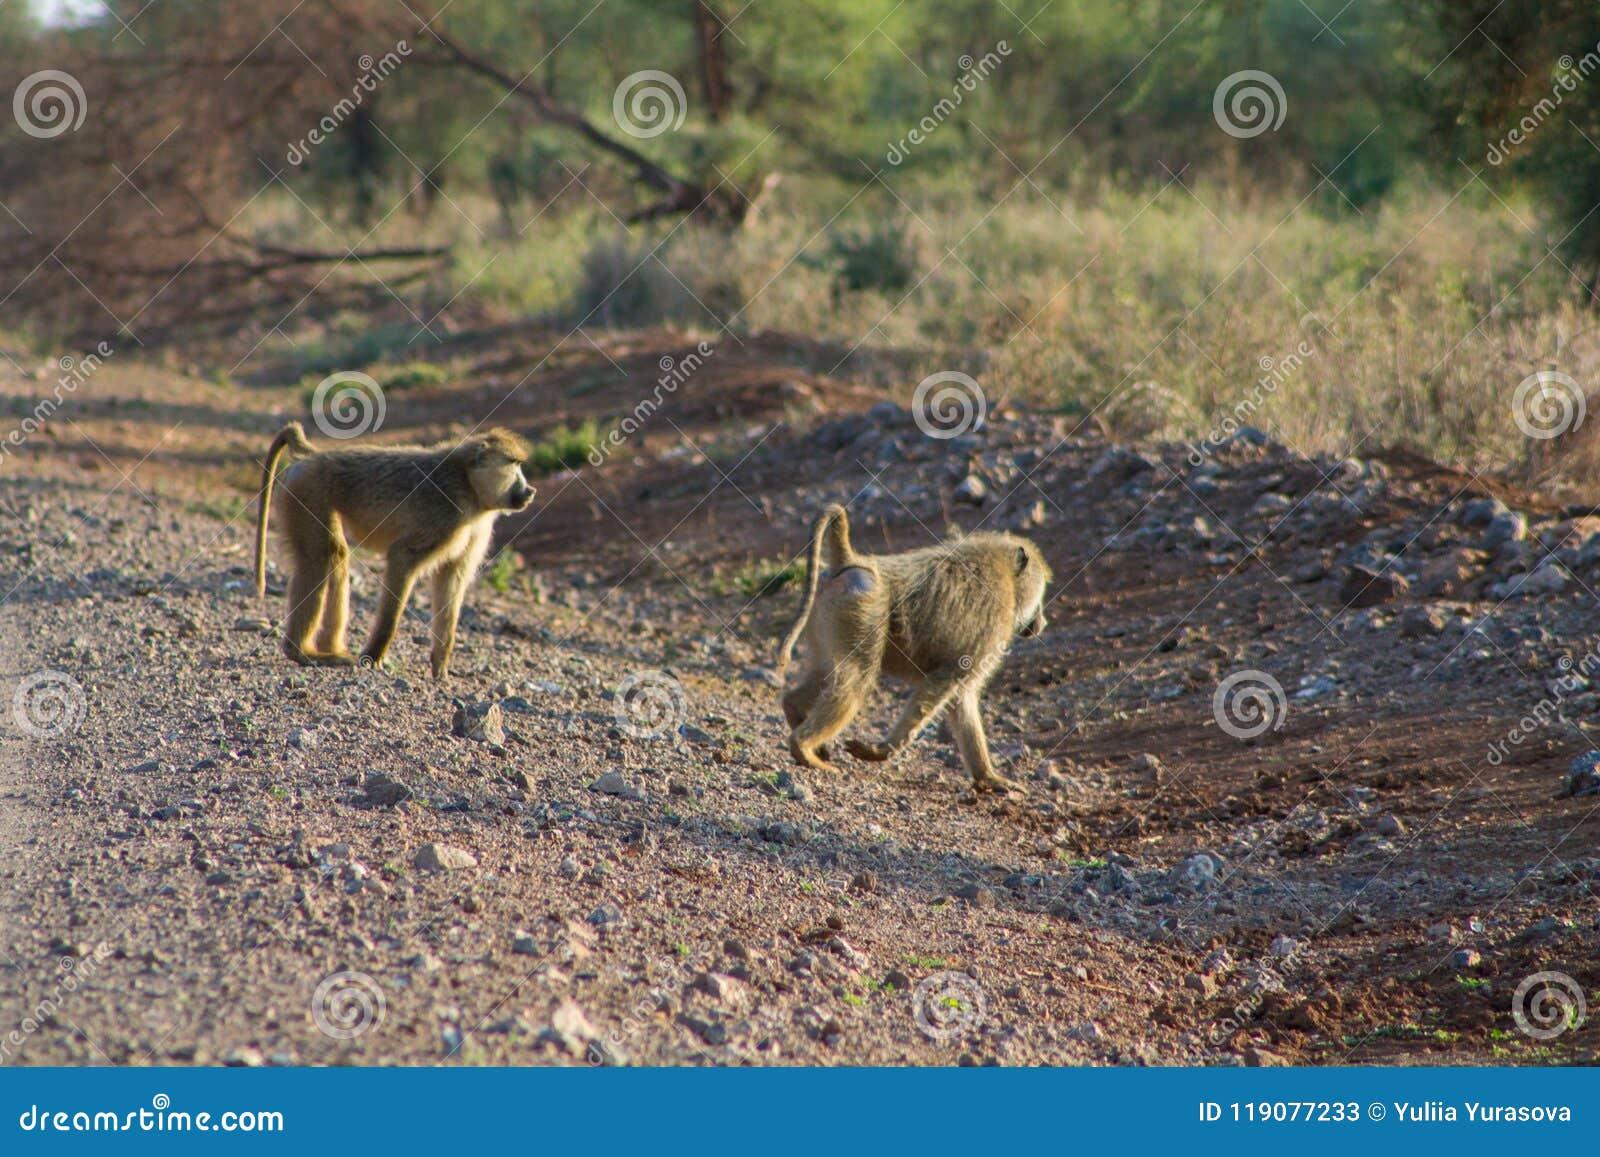 Baboon monkey walk on road in Africa wildlife